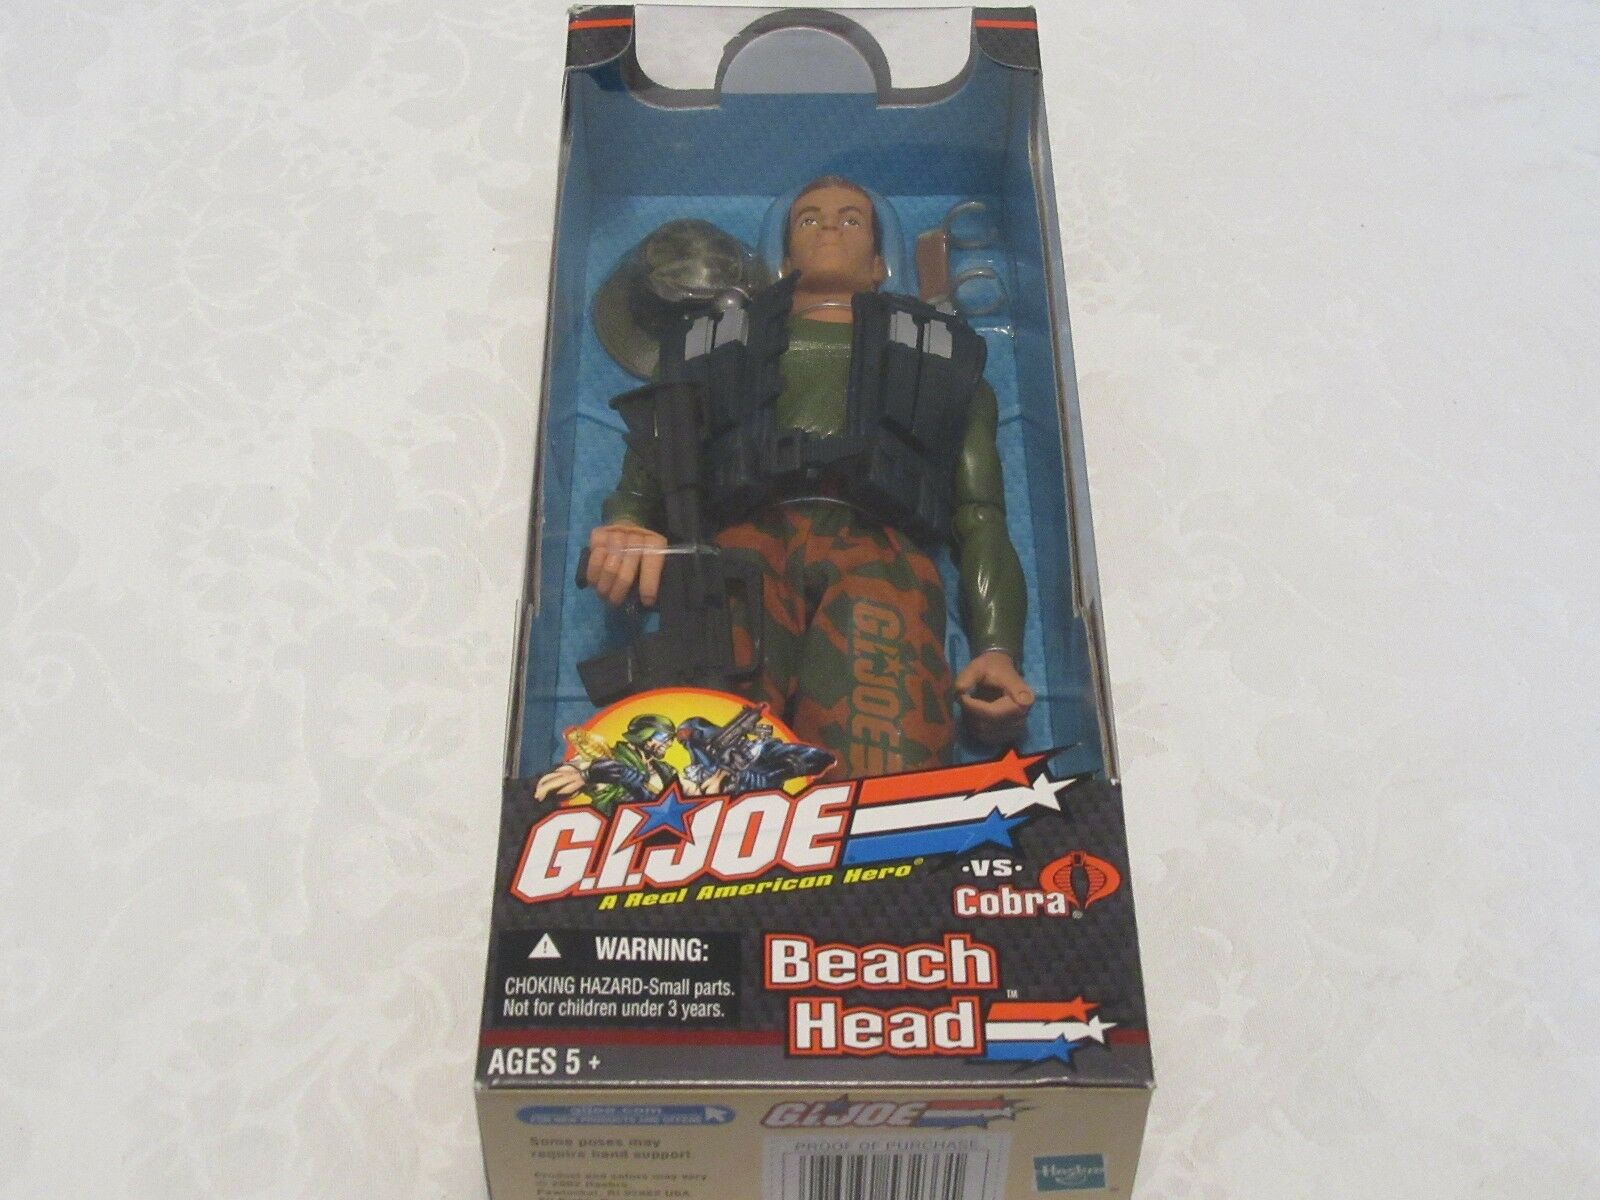 Hasbro GI G.i. Joe vs Cobra Beach Head Beachhead 12  Inch Action Figure